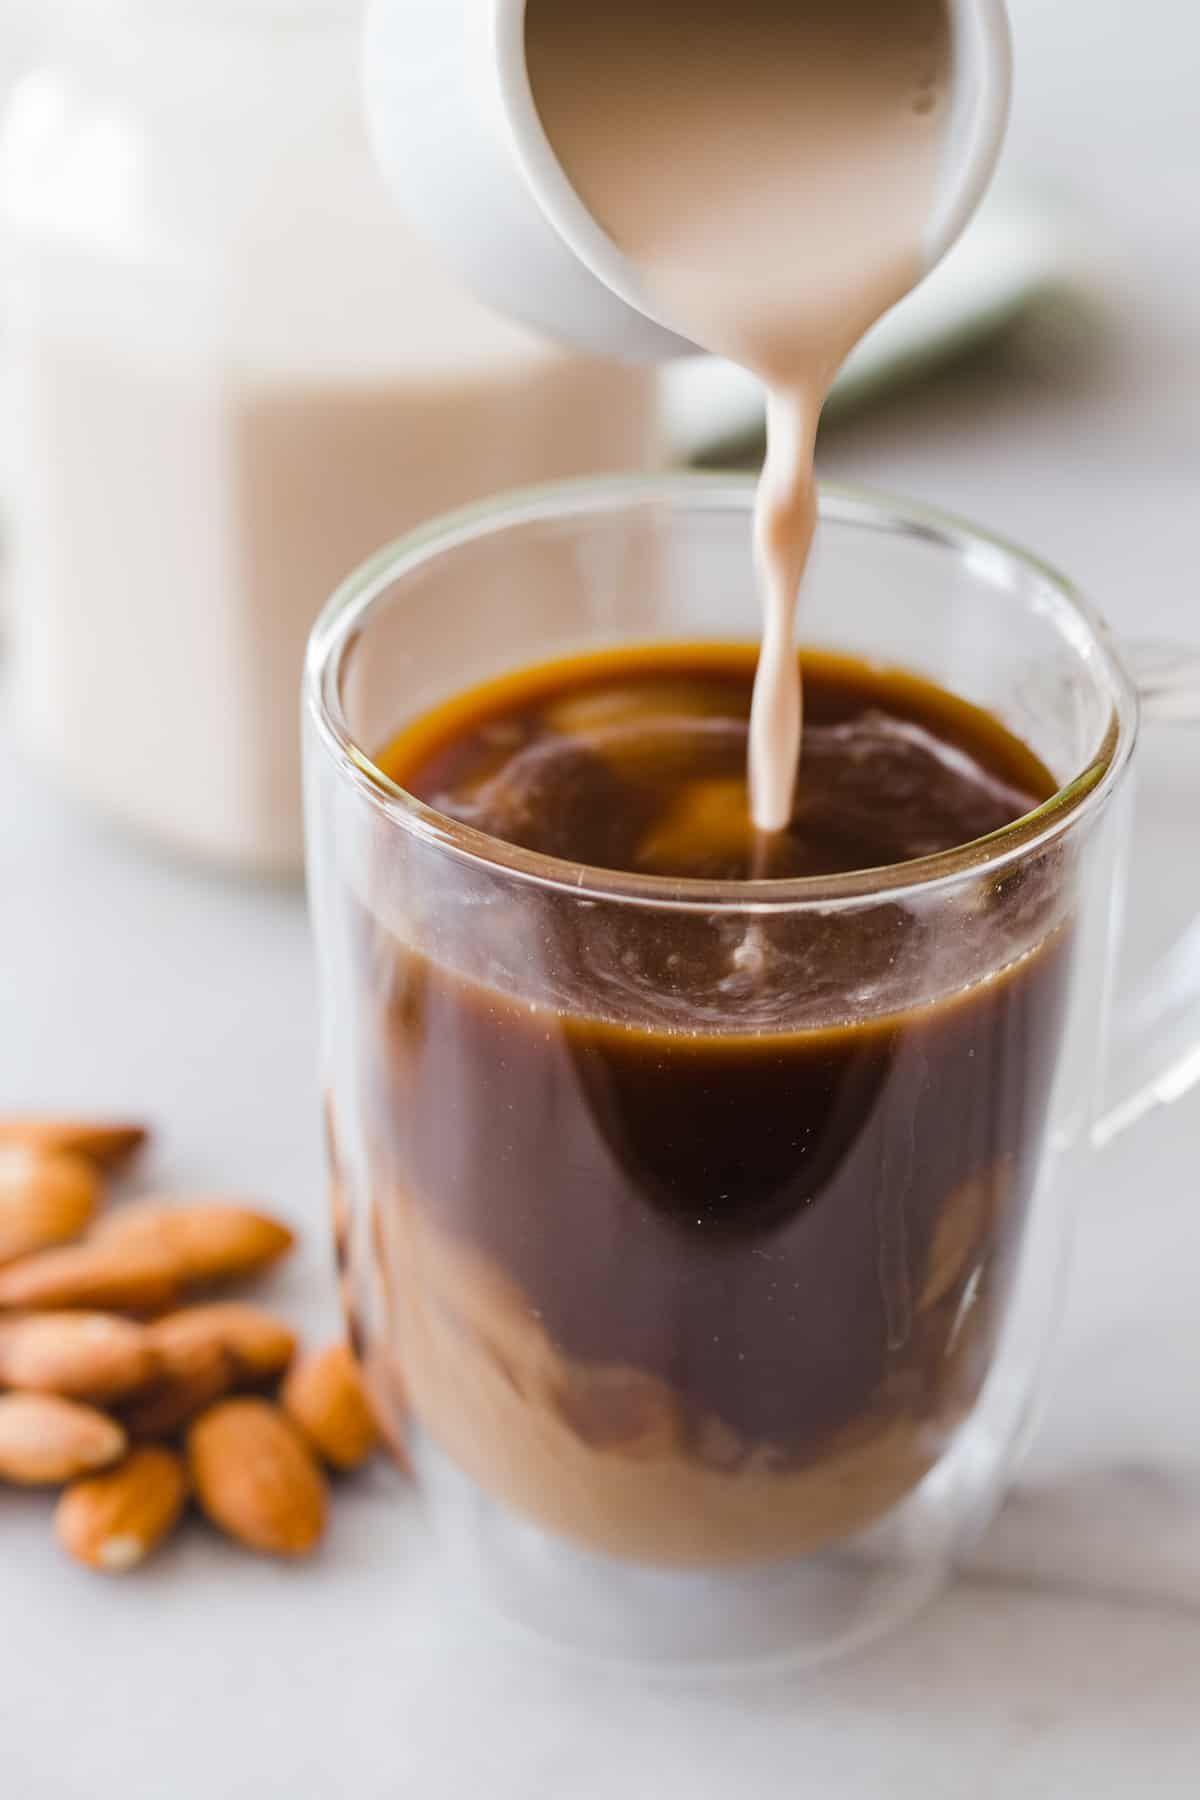 diy coffee creamer with almond milk